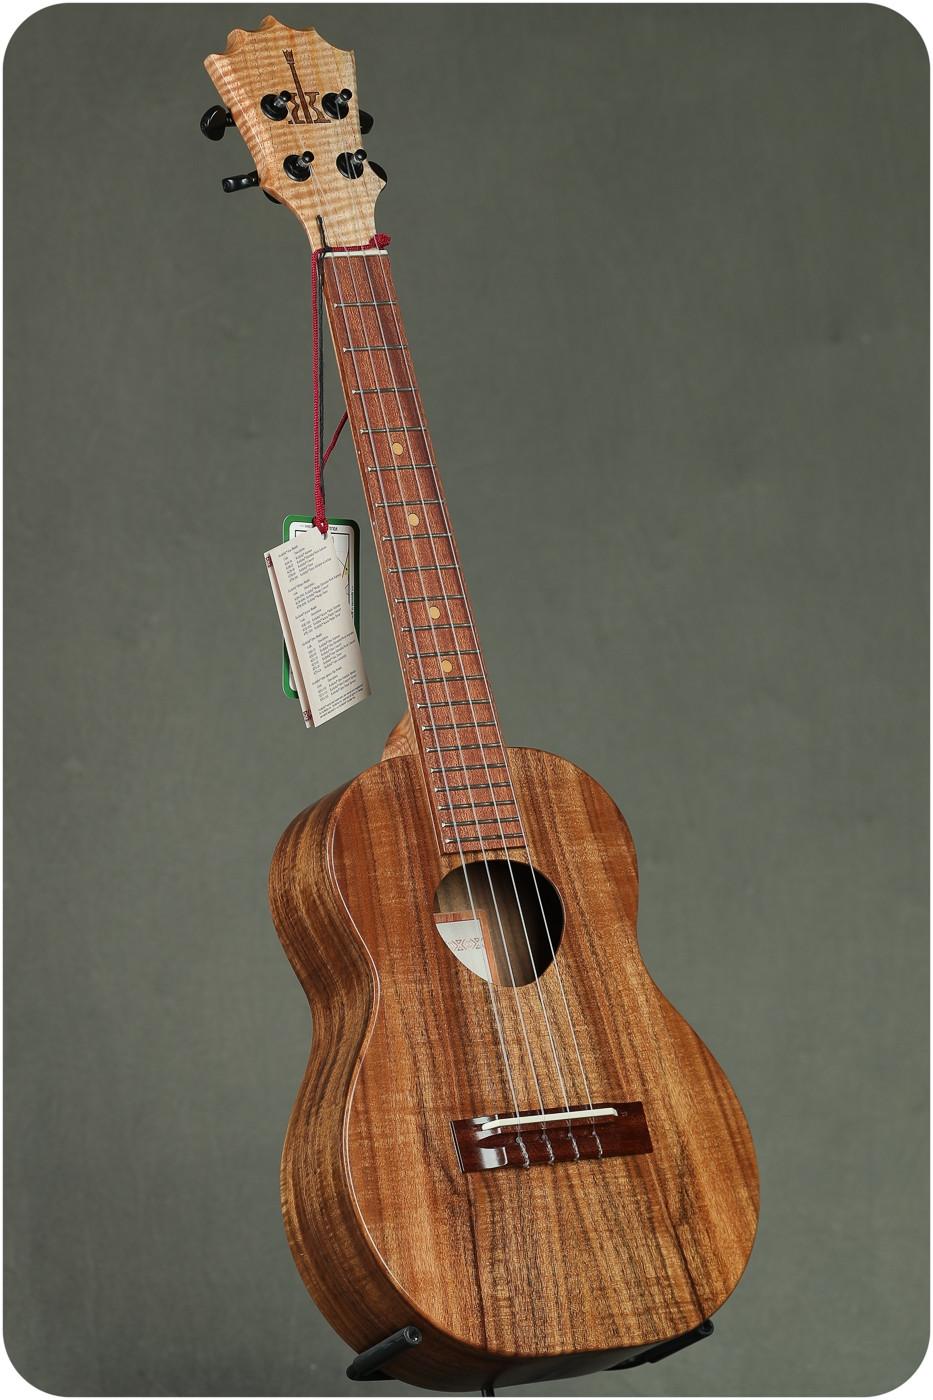 Koaloha Tenor Acacia Opio Ukulele Package (KTO-10 19104)